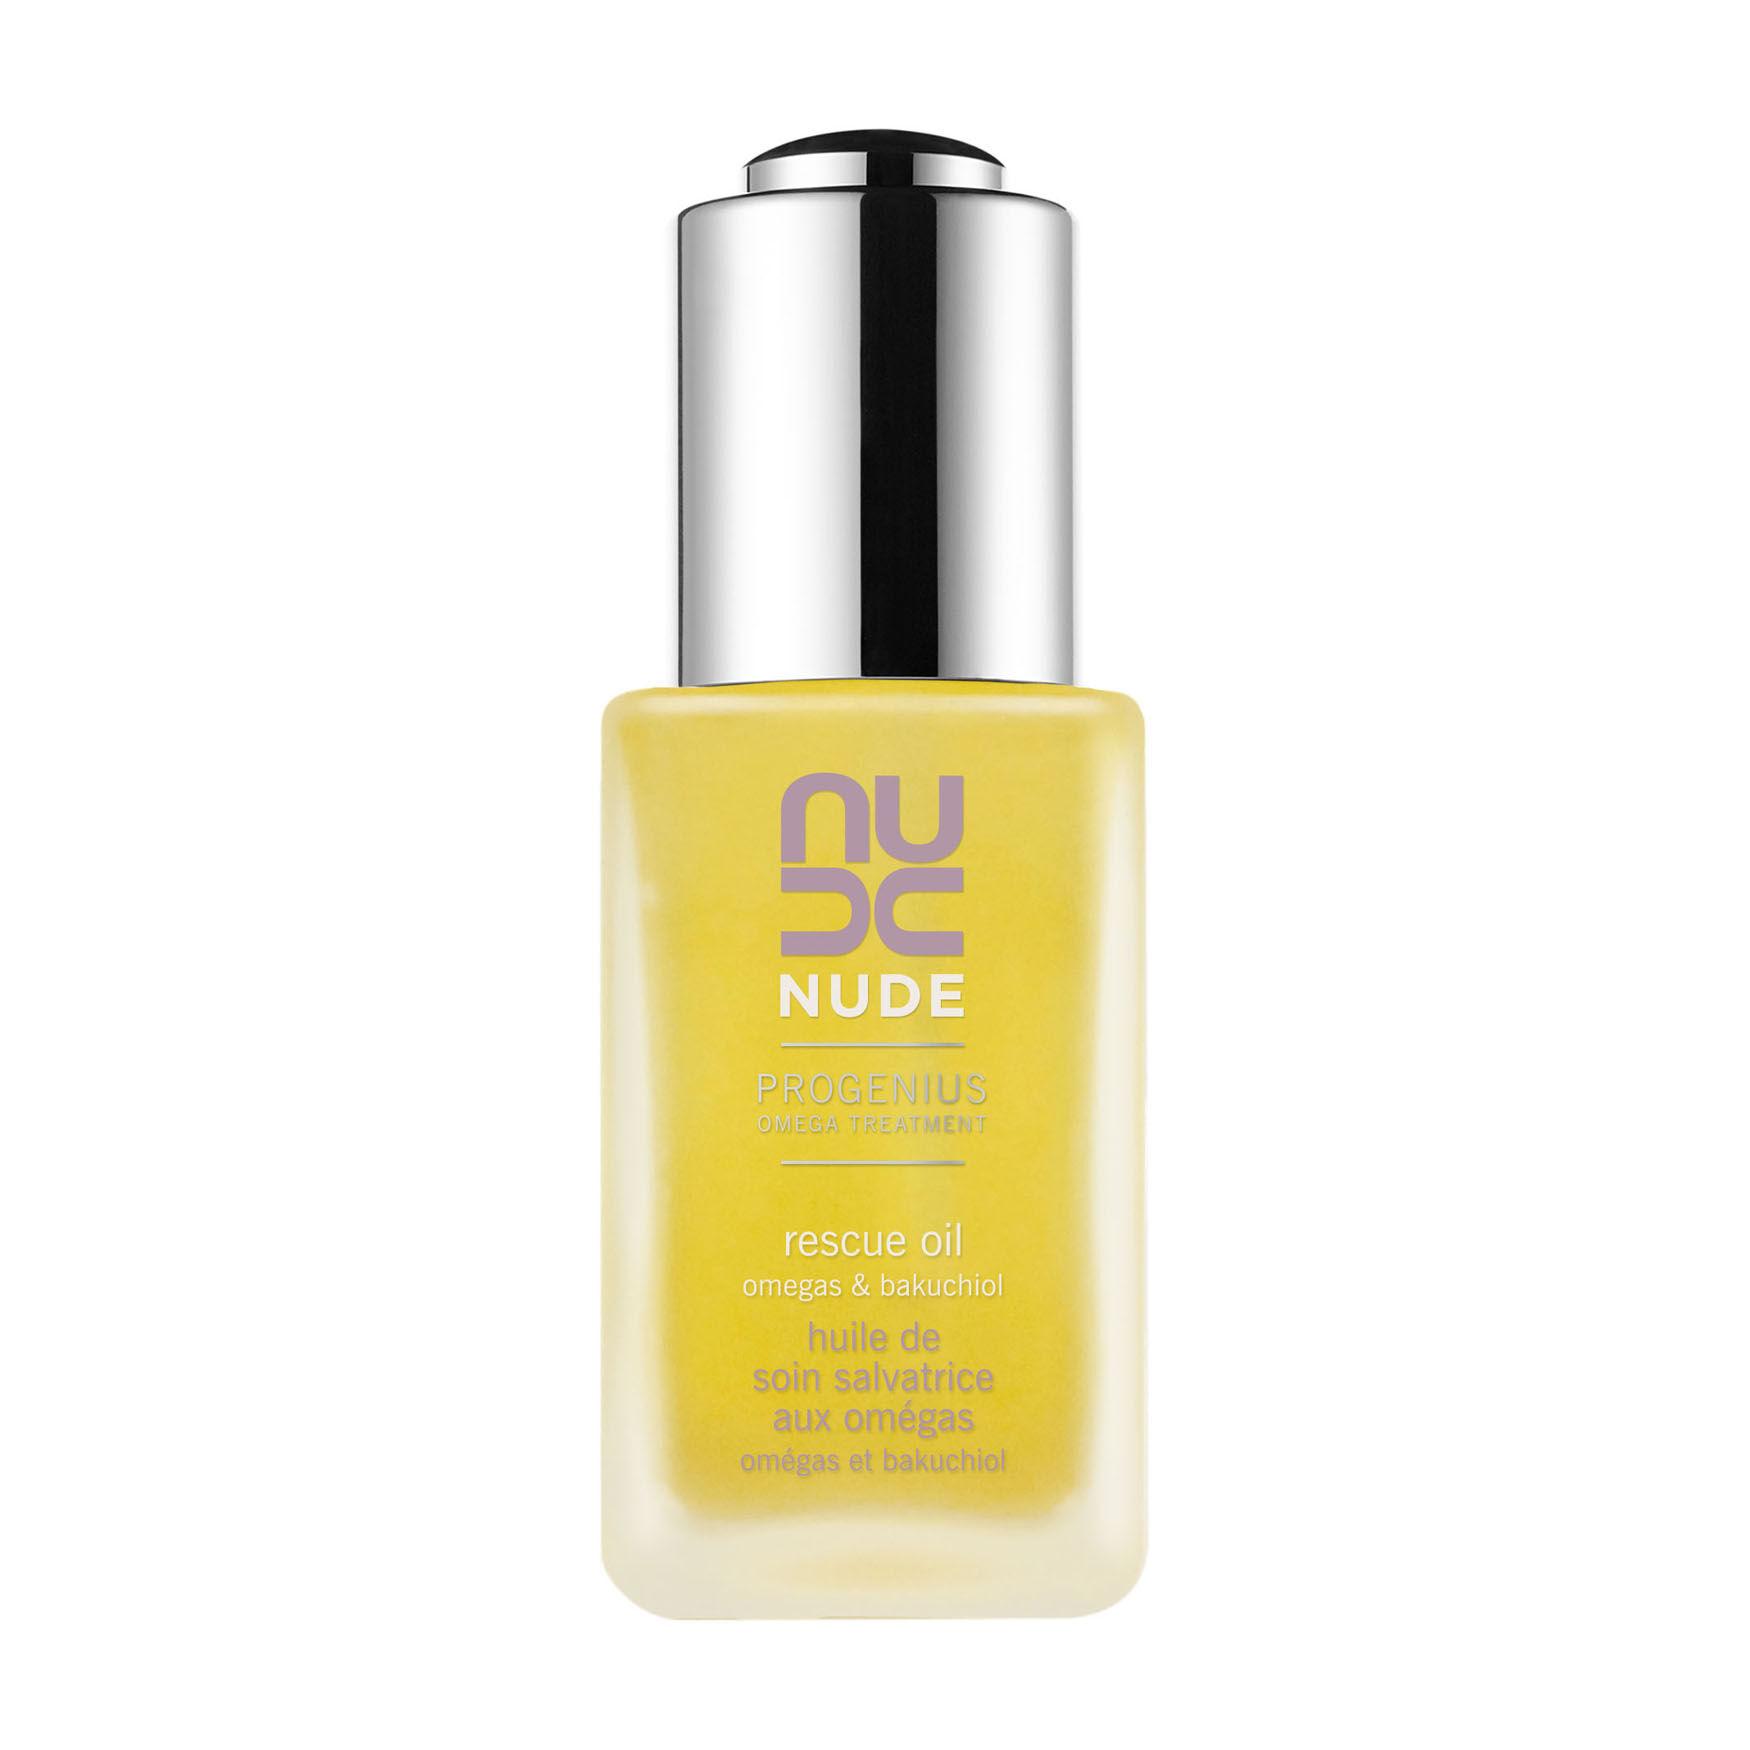 Nude skincare progenius treatment oil pics 67